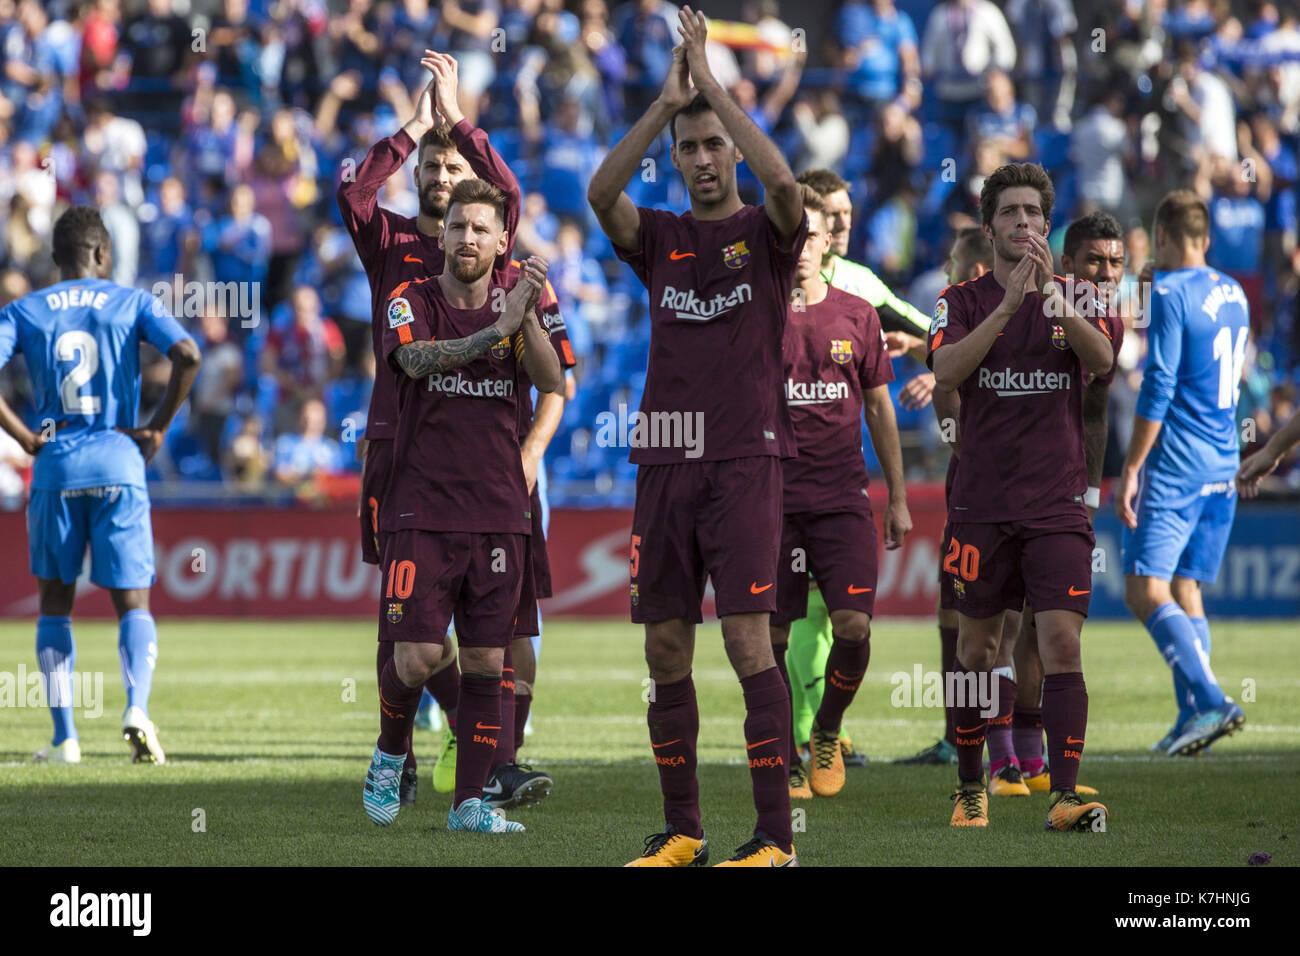 Applaud To Spanish Stock Photos Applaud To Spanish Stock Images  # Muebles Getafe Butragueno